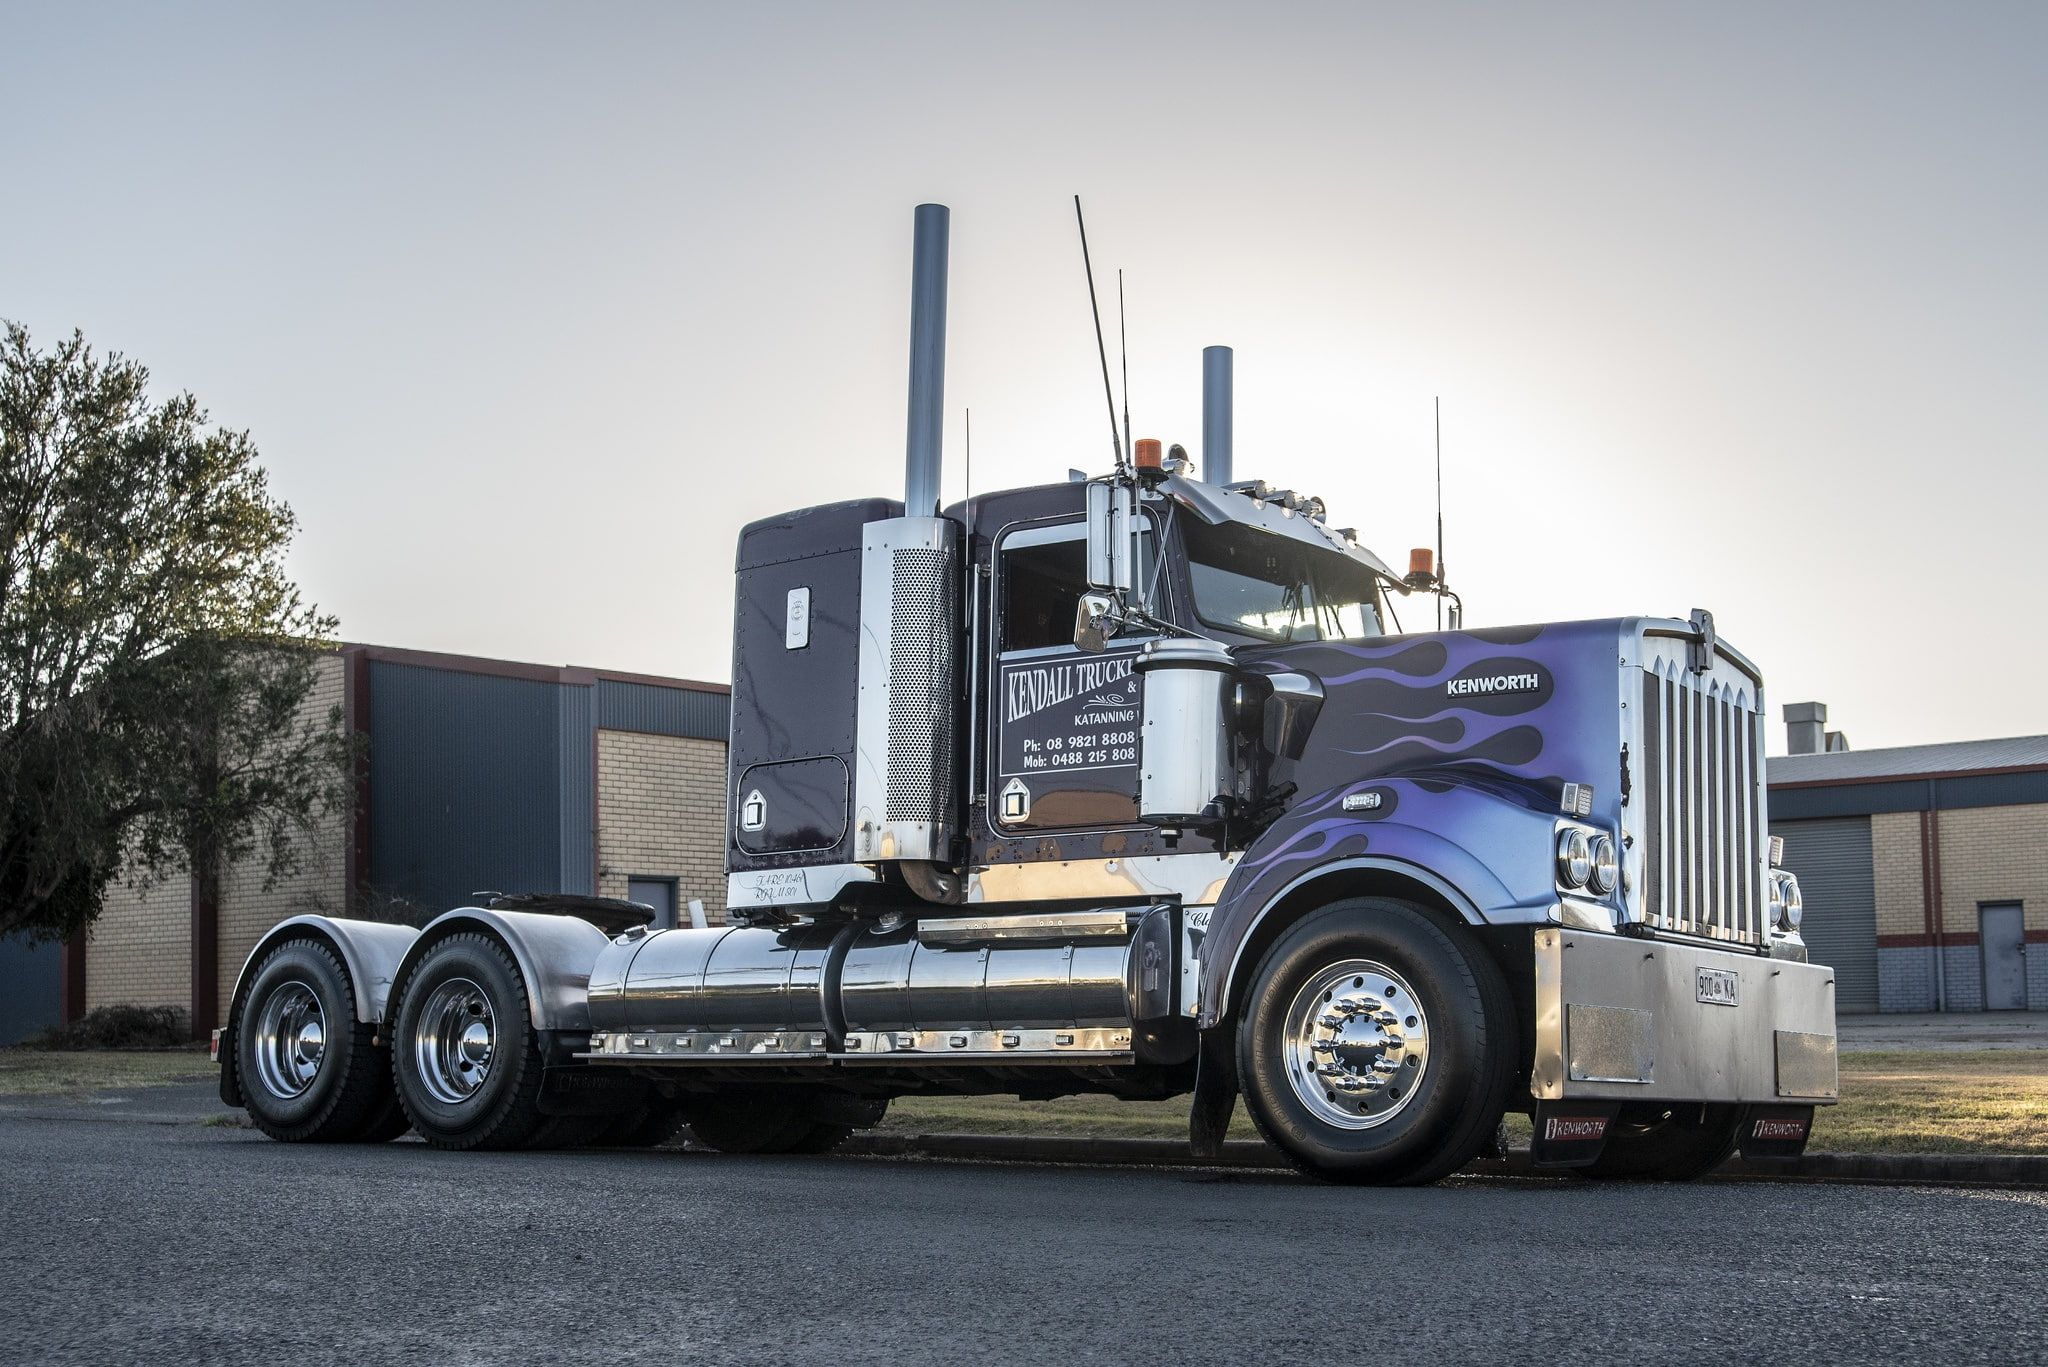 Truck Kenworth T409 1080p Wallpaper Hdwallpaper Desktop Trucks Kenworth American Truck Simulator